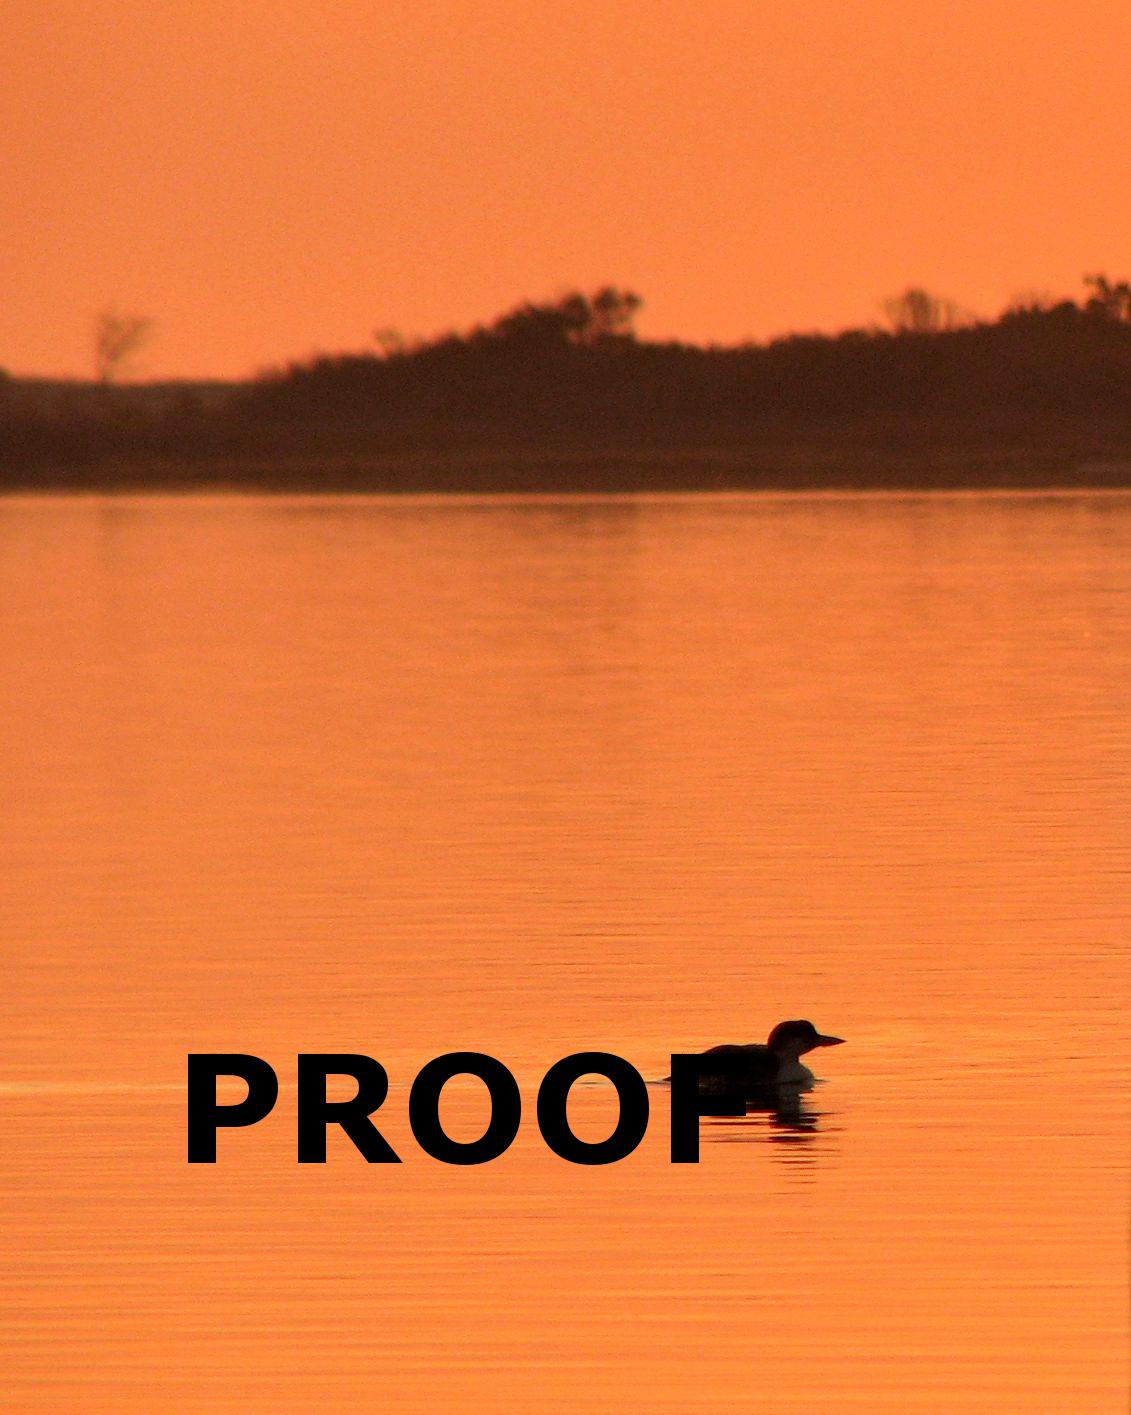 1131x1415 Sunrise Loon Silhouette Proof